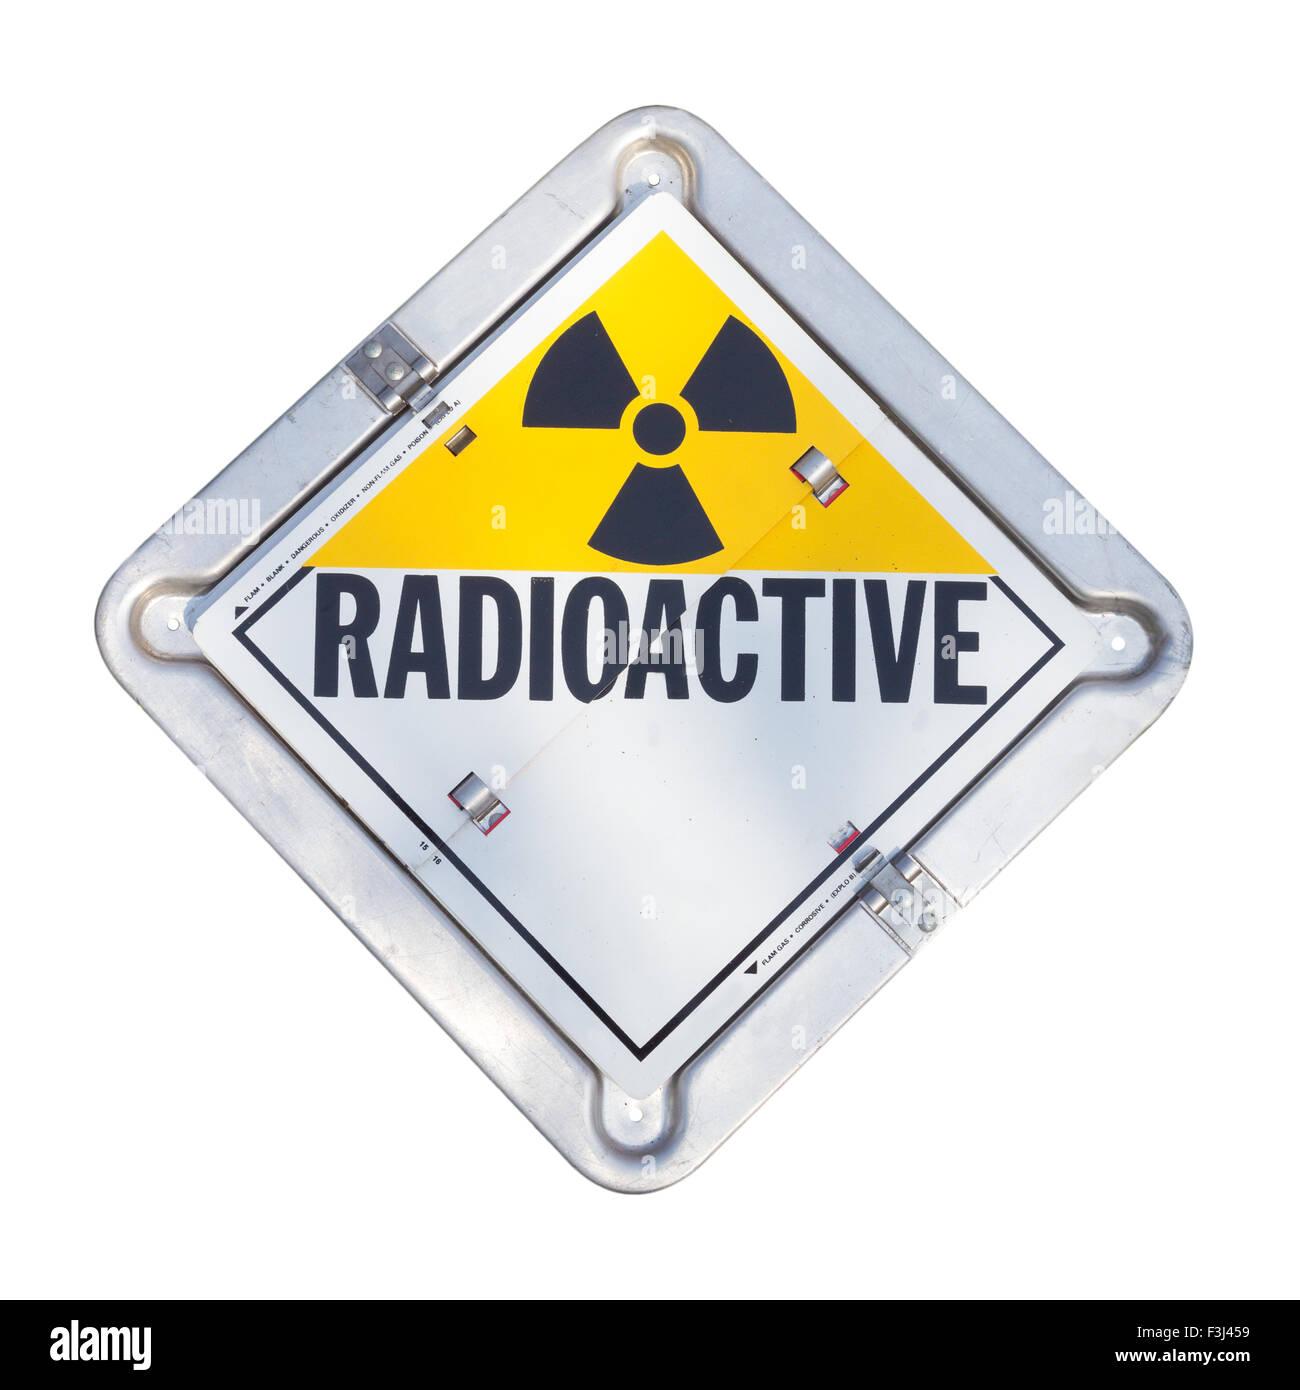 Truck transport radioactive warning sign. - Stock Image